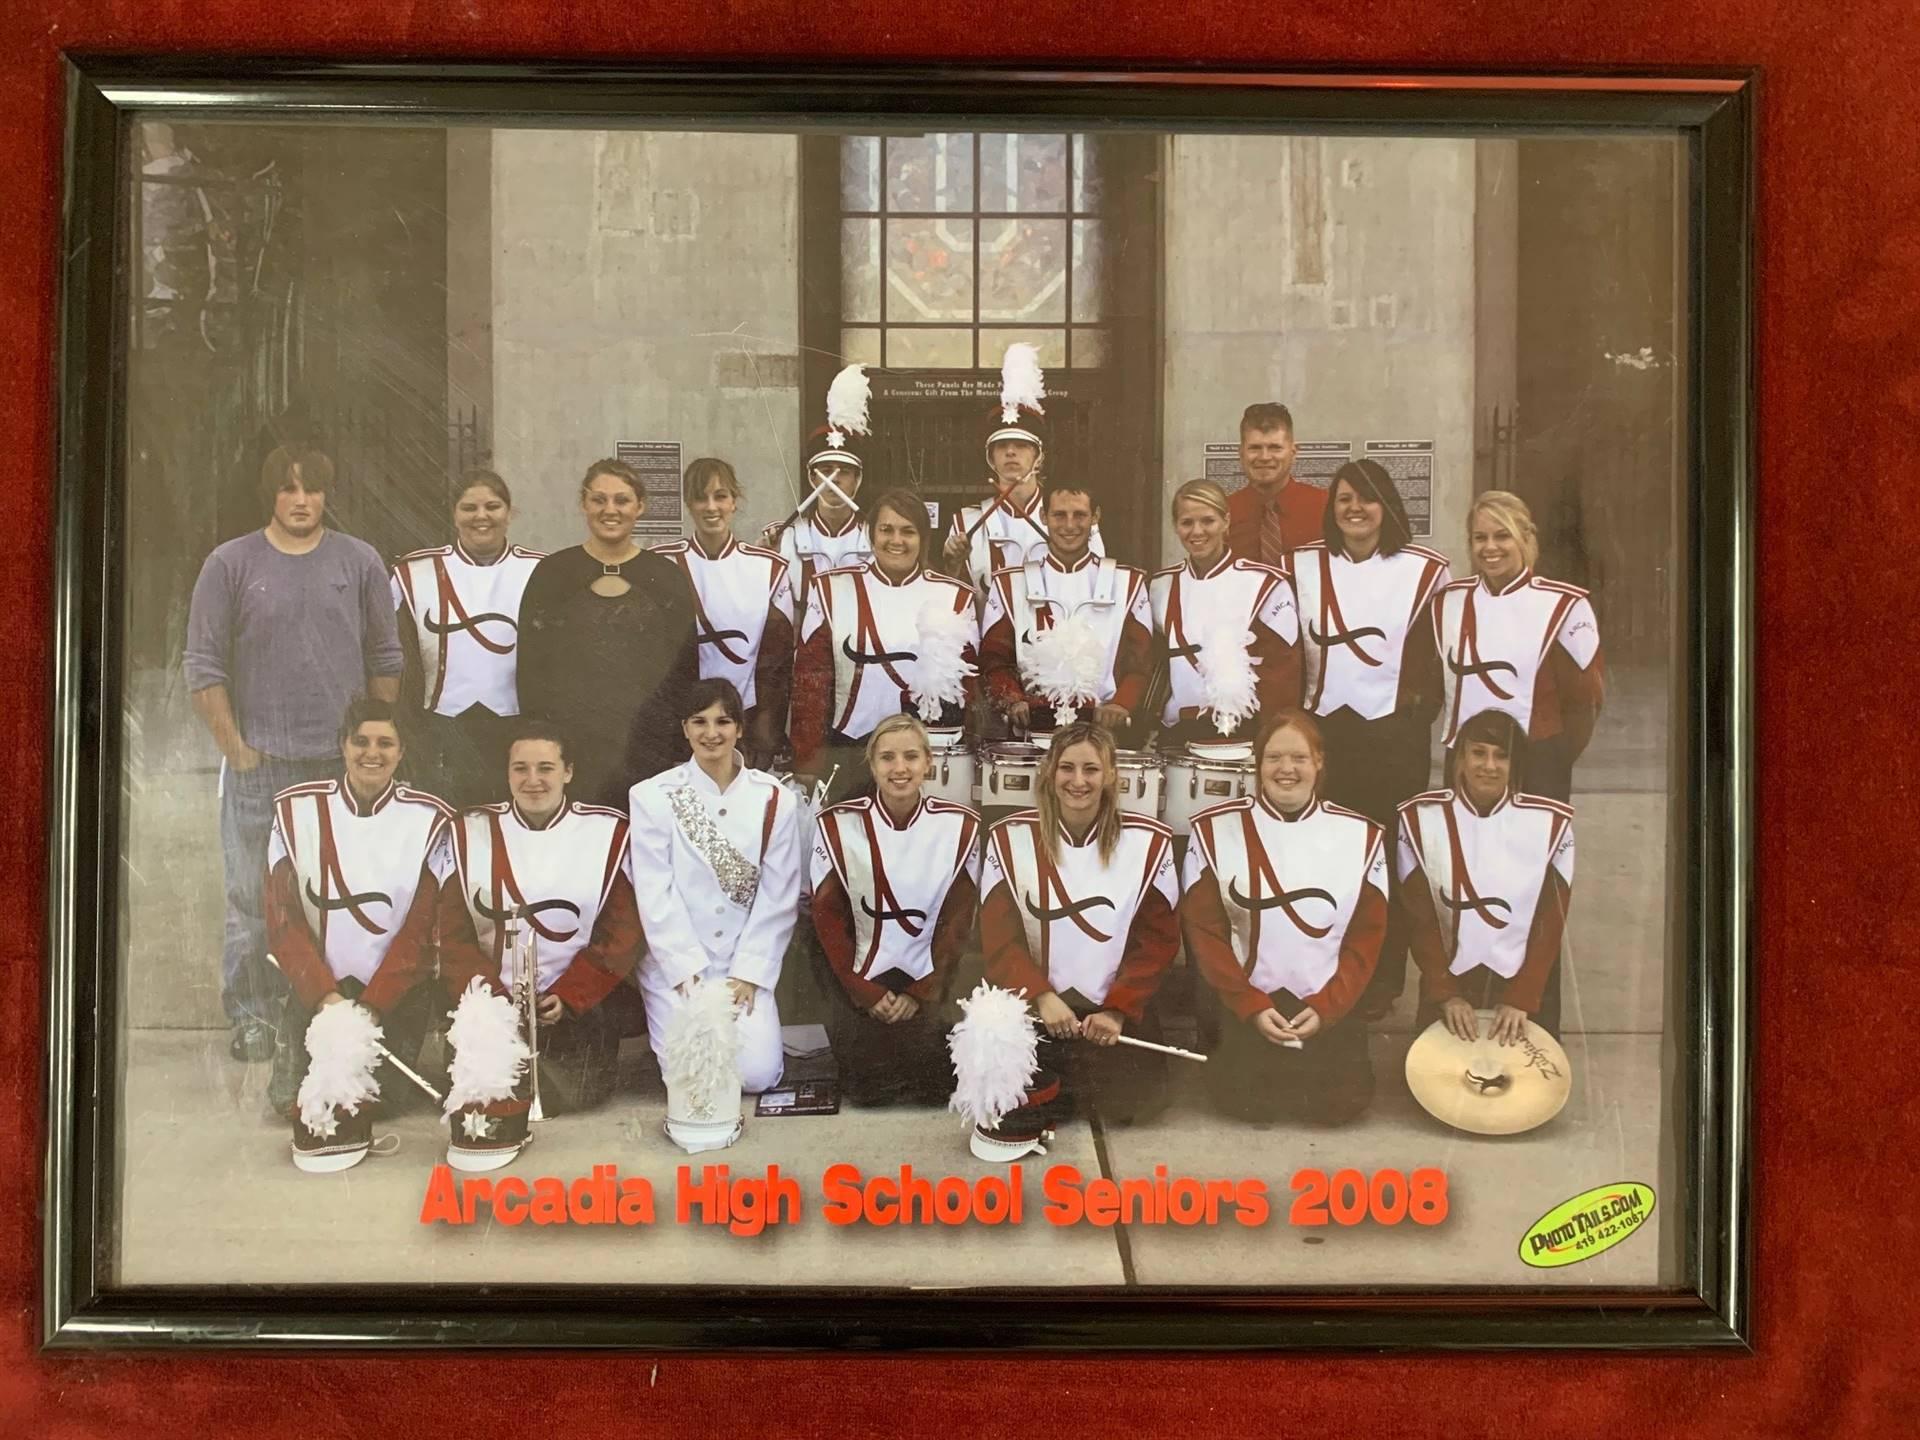 Arcadia High School Seniors of 2008